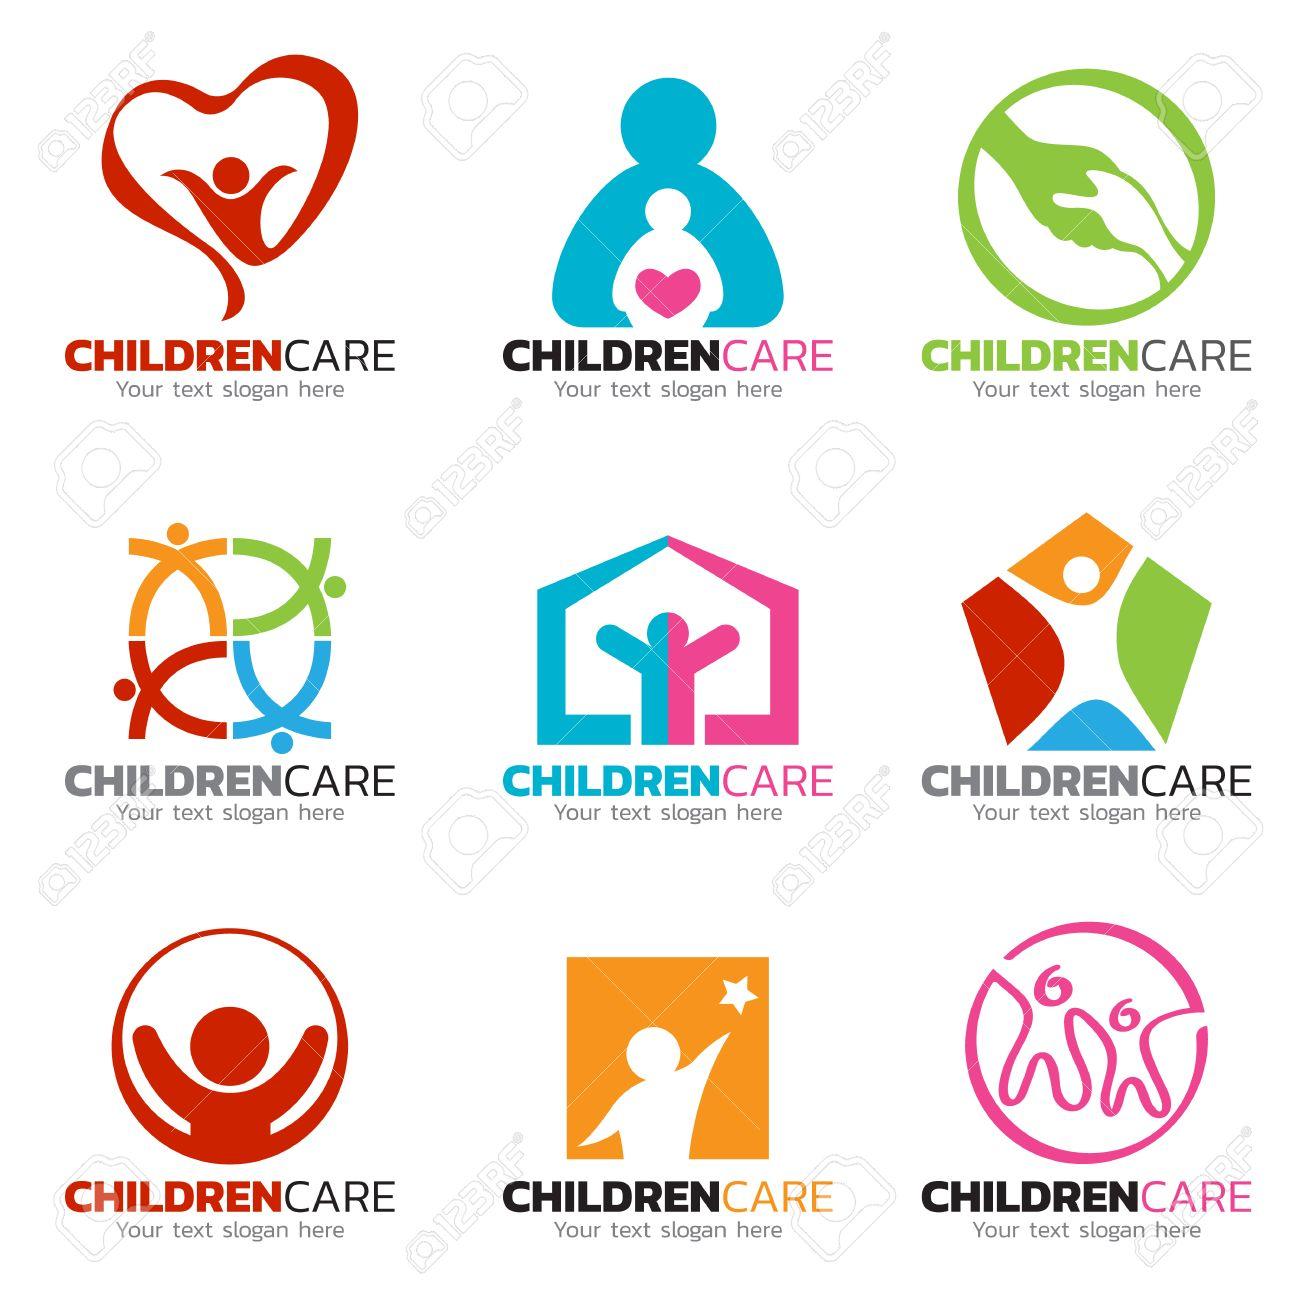 residential home health logo ideas - Home Health Logo Design